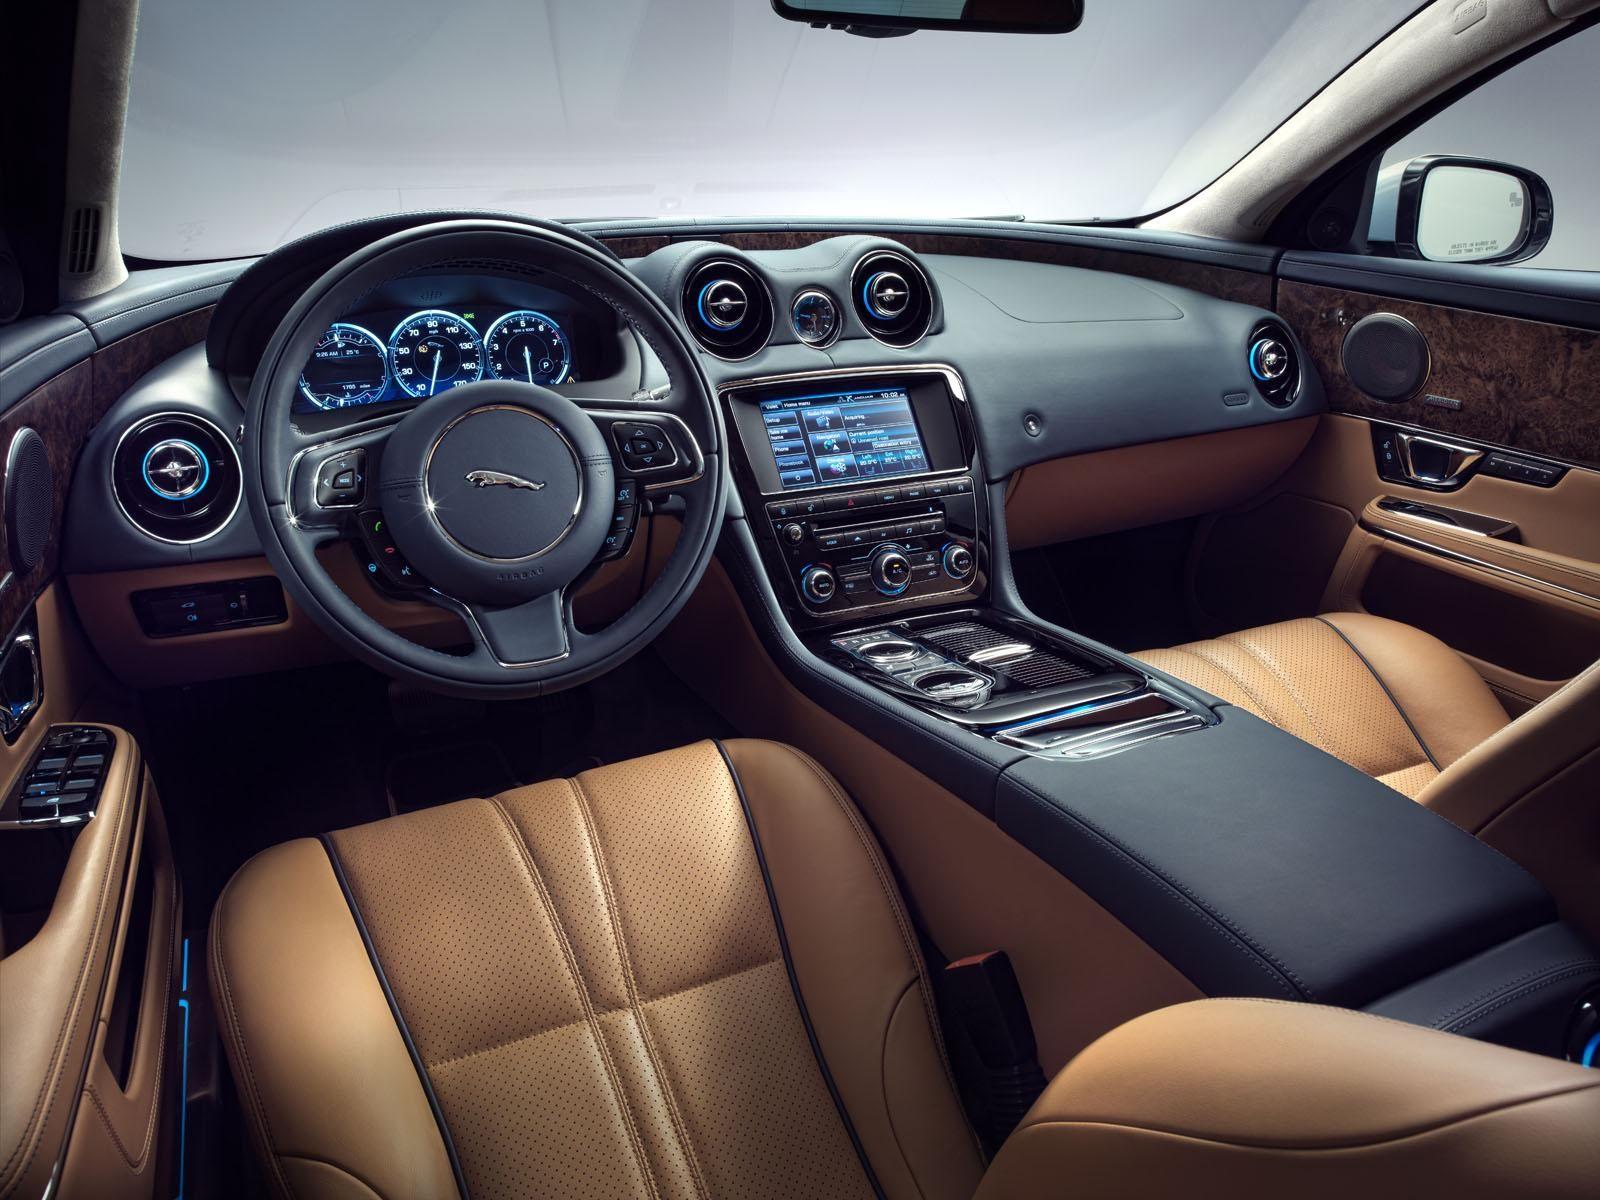 Lovely Gallery For Jaguar XJ Interior   Image